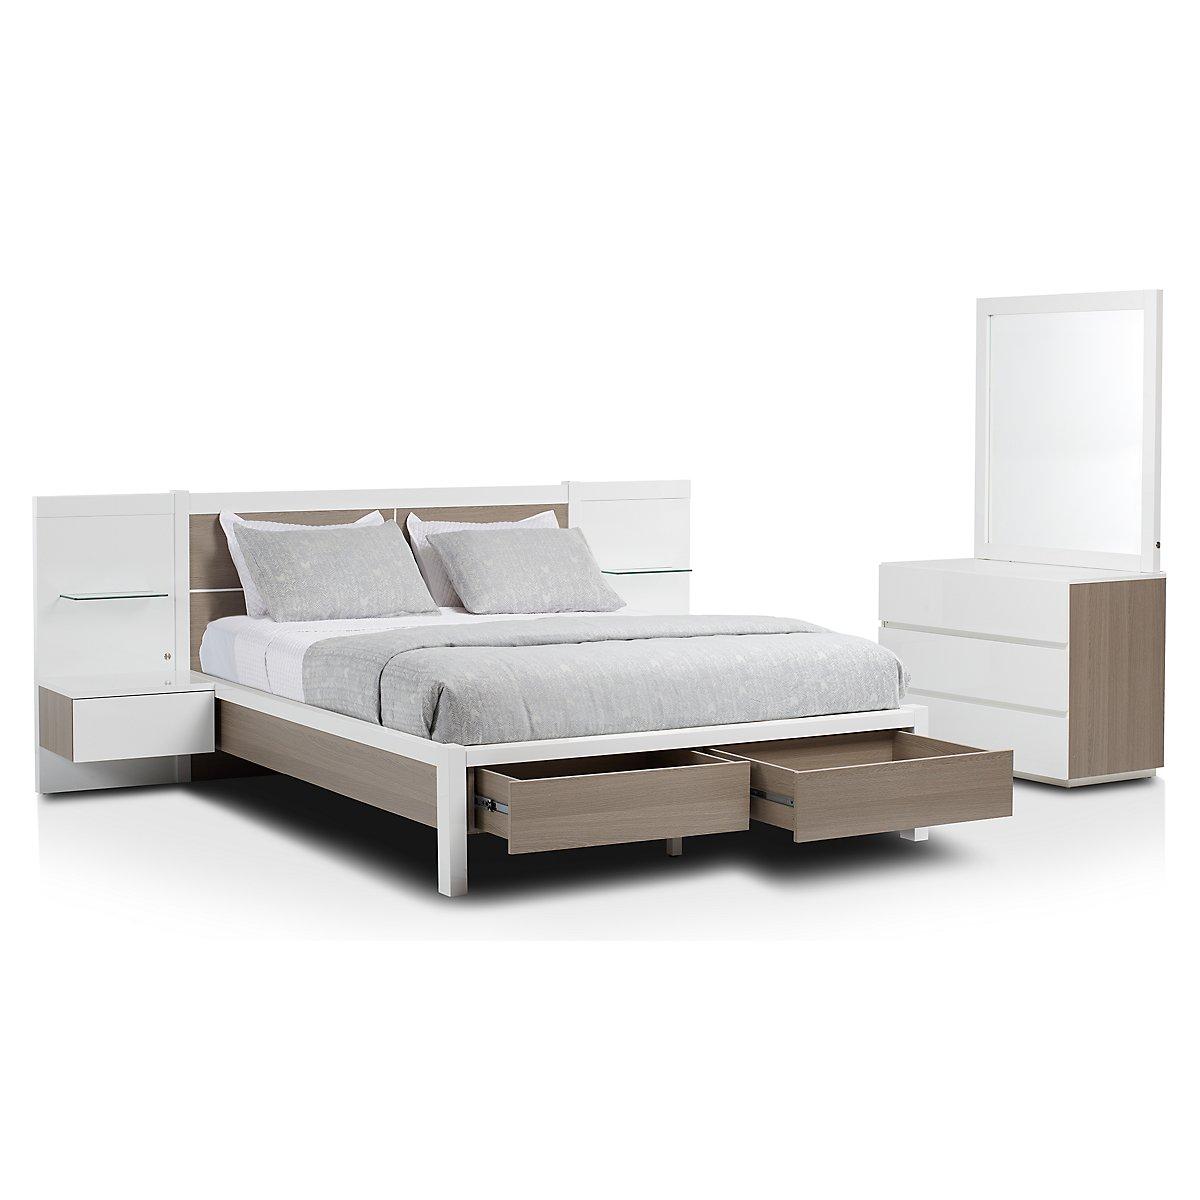 Pesaro Two-Tone Spread Storage Bedroom | Bedroom - Bedroom Sets ...